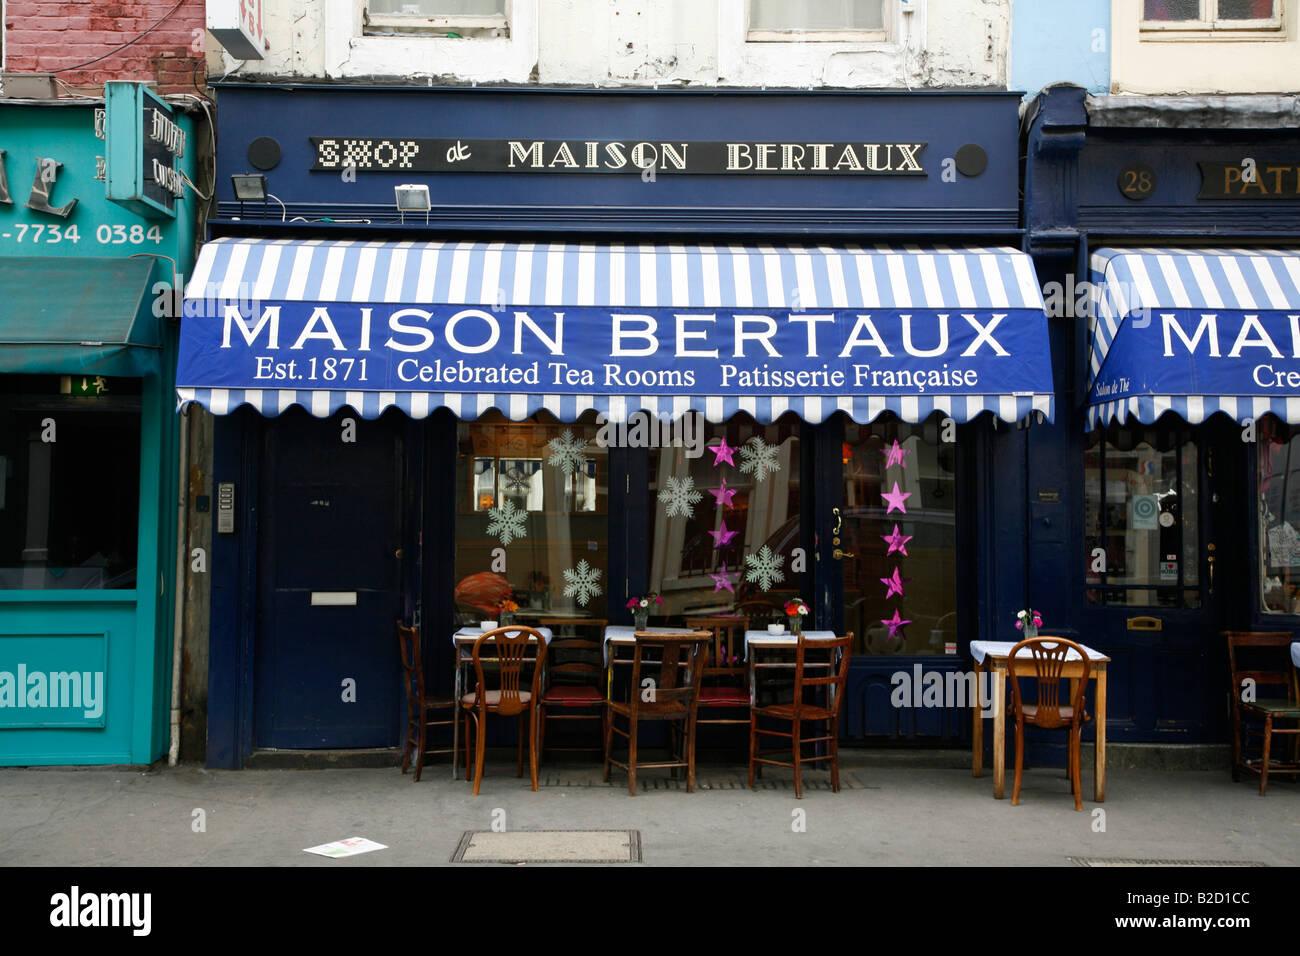 Maison Bertaux patisserie on Greek Street, Soho, London - Stock Image